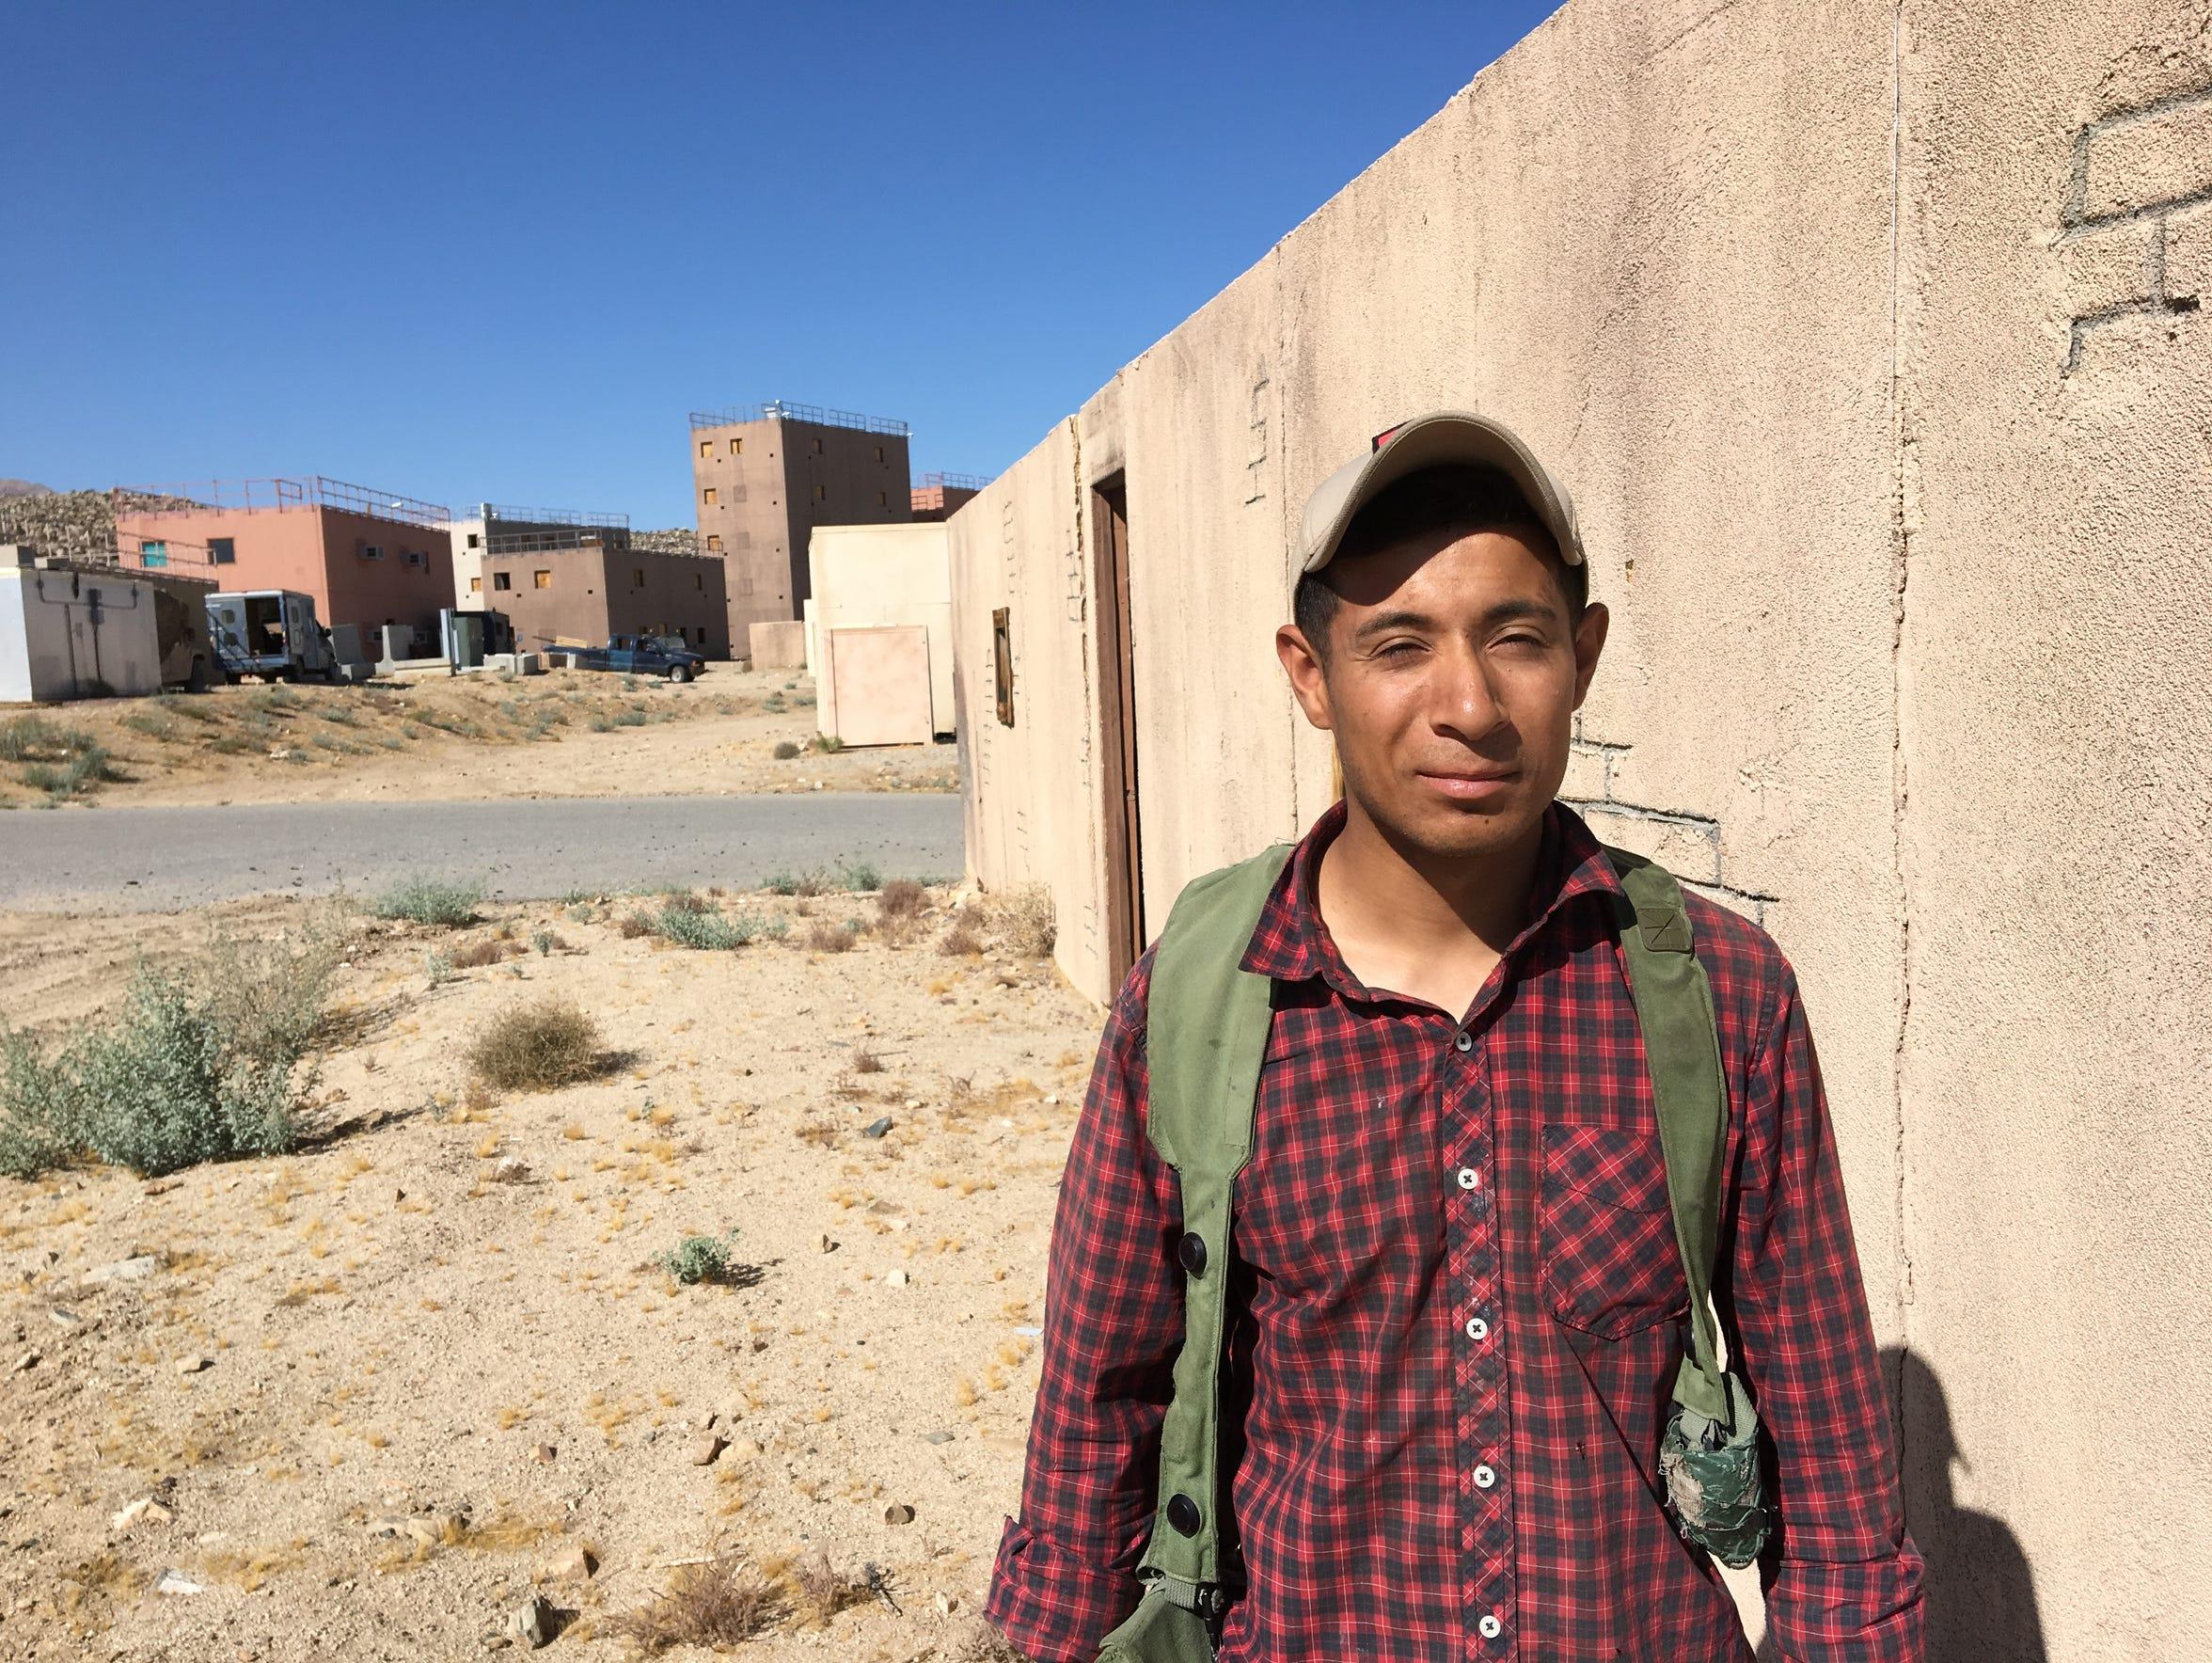 First Lt. Daniel Flores, of El Paso, is a platoon leader